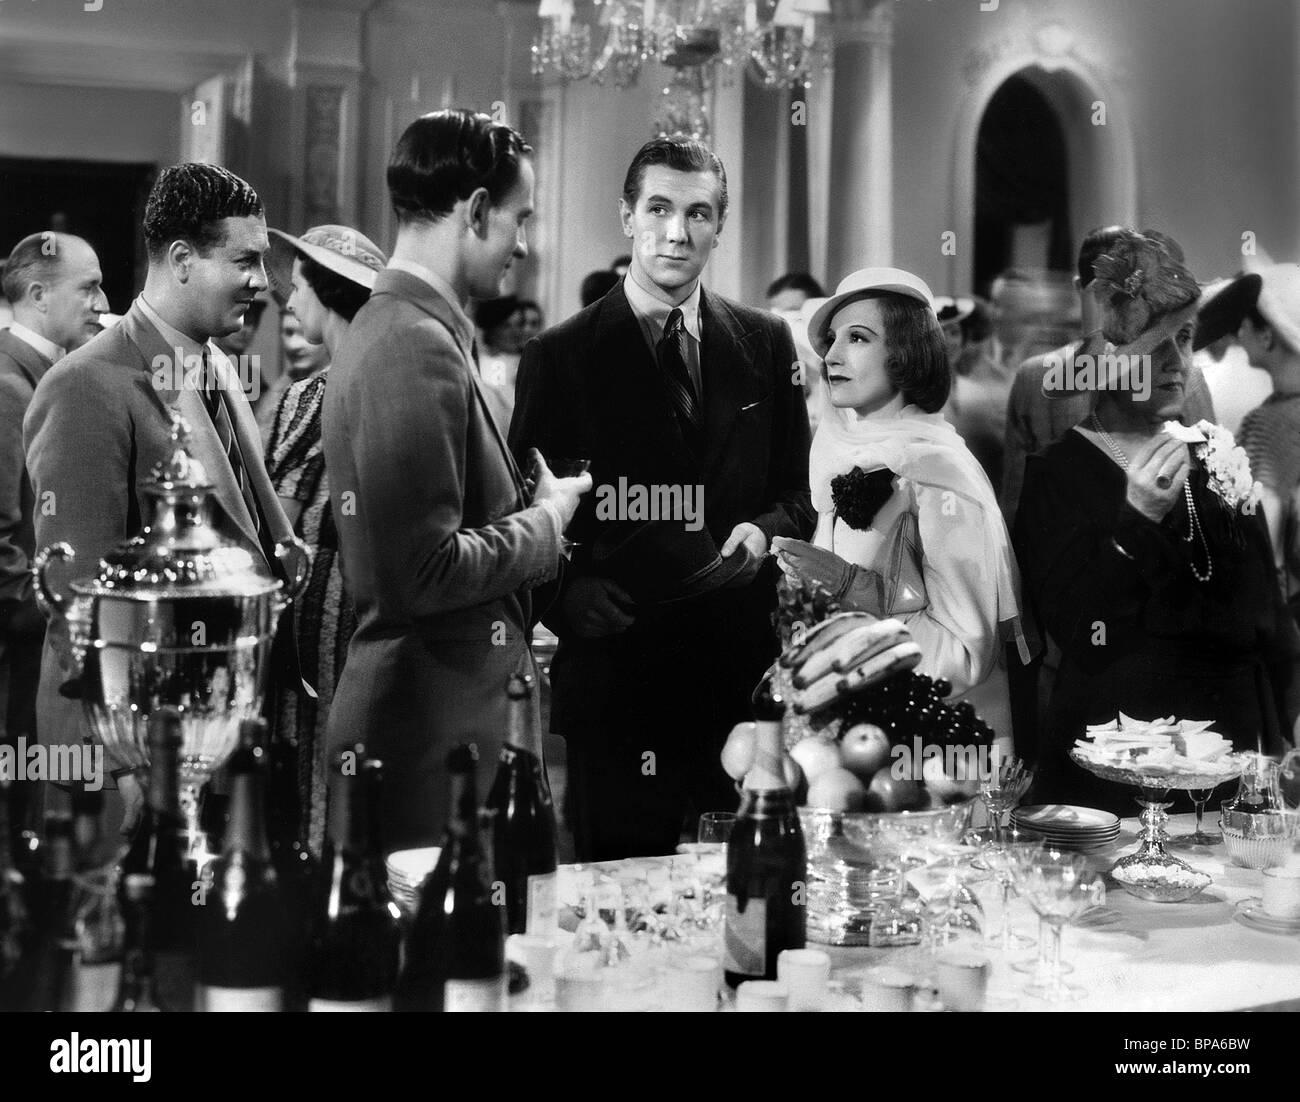 ELISABETH BERGNER A STOLEN LIFE (1937 Stock Photo: 30957357 - Alamy